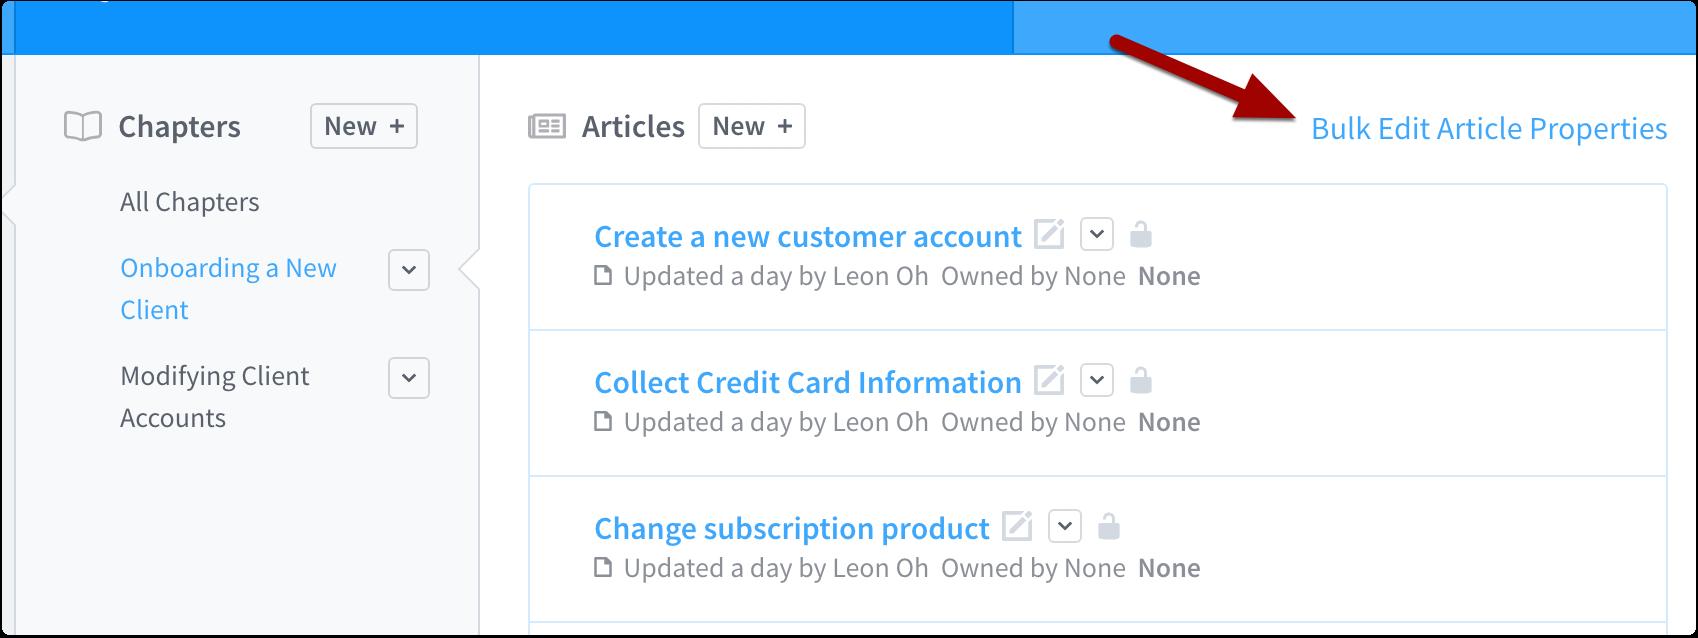 Bulk edit article properties